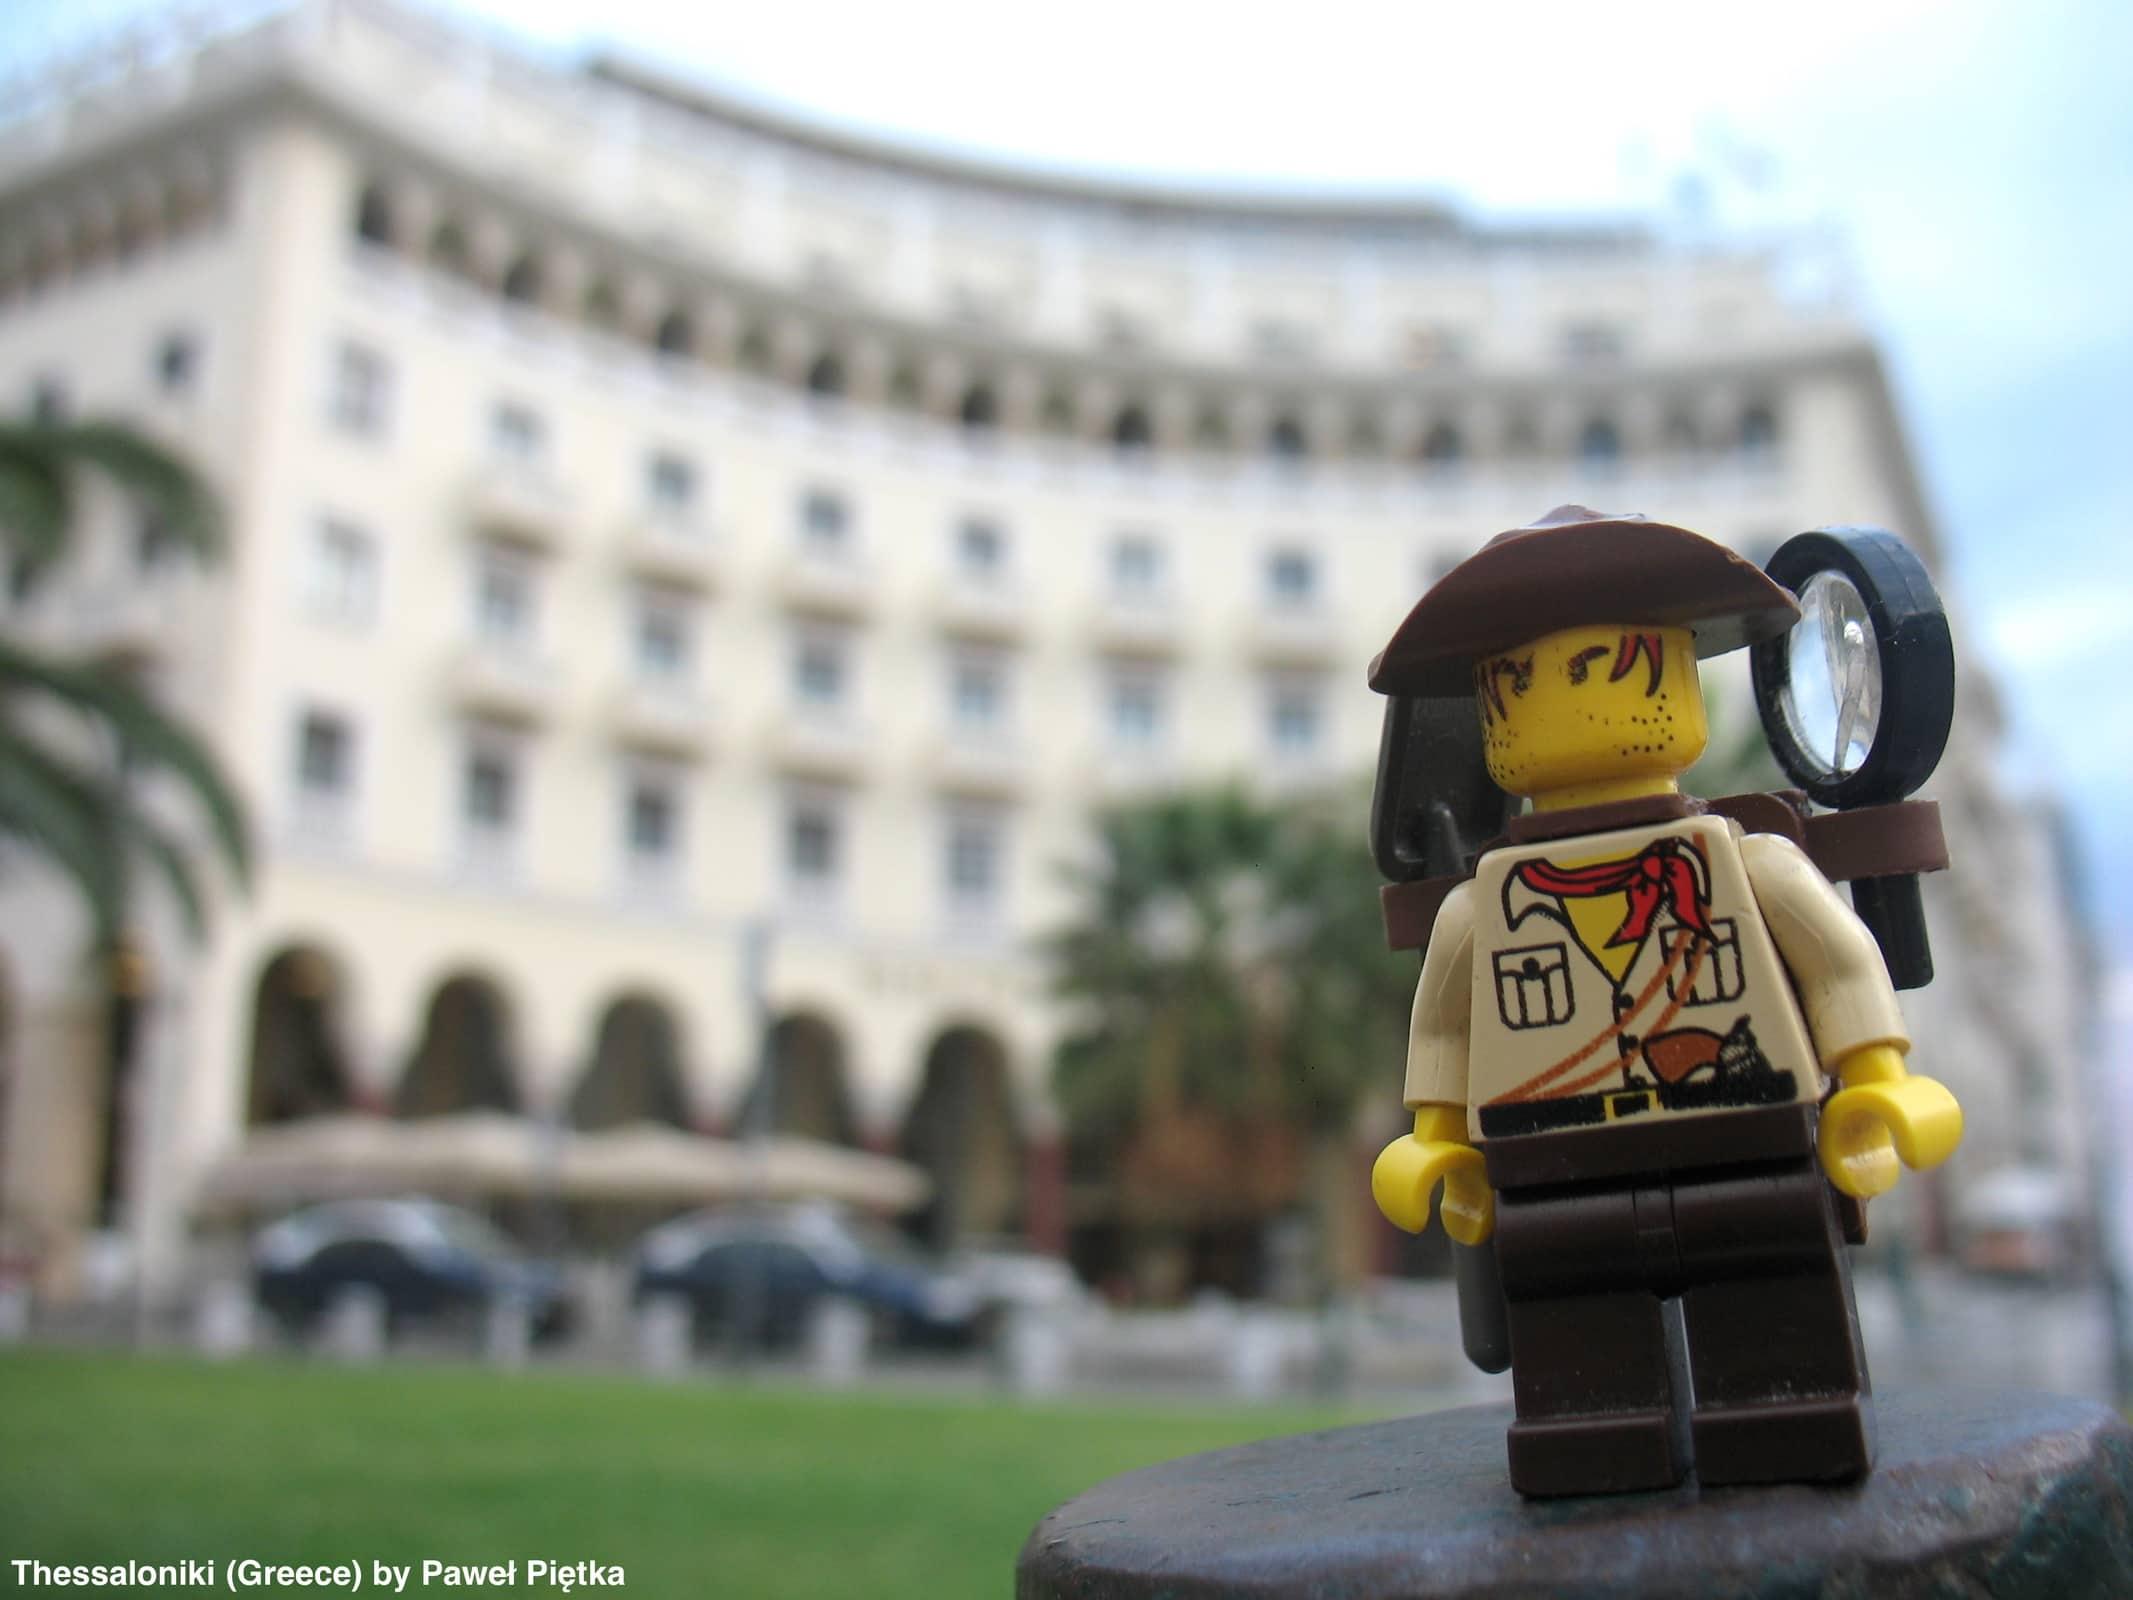 Thessaloniki (Greece) - Aristotelous Square